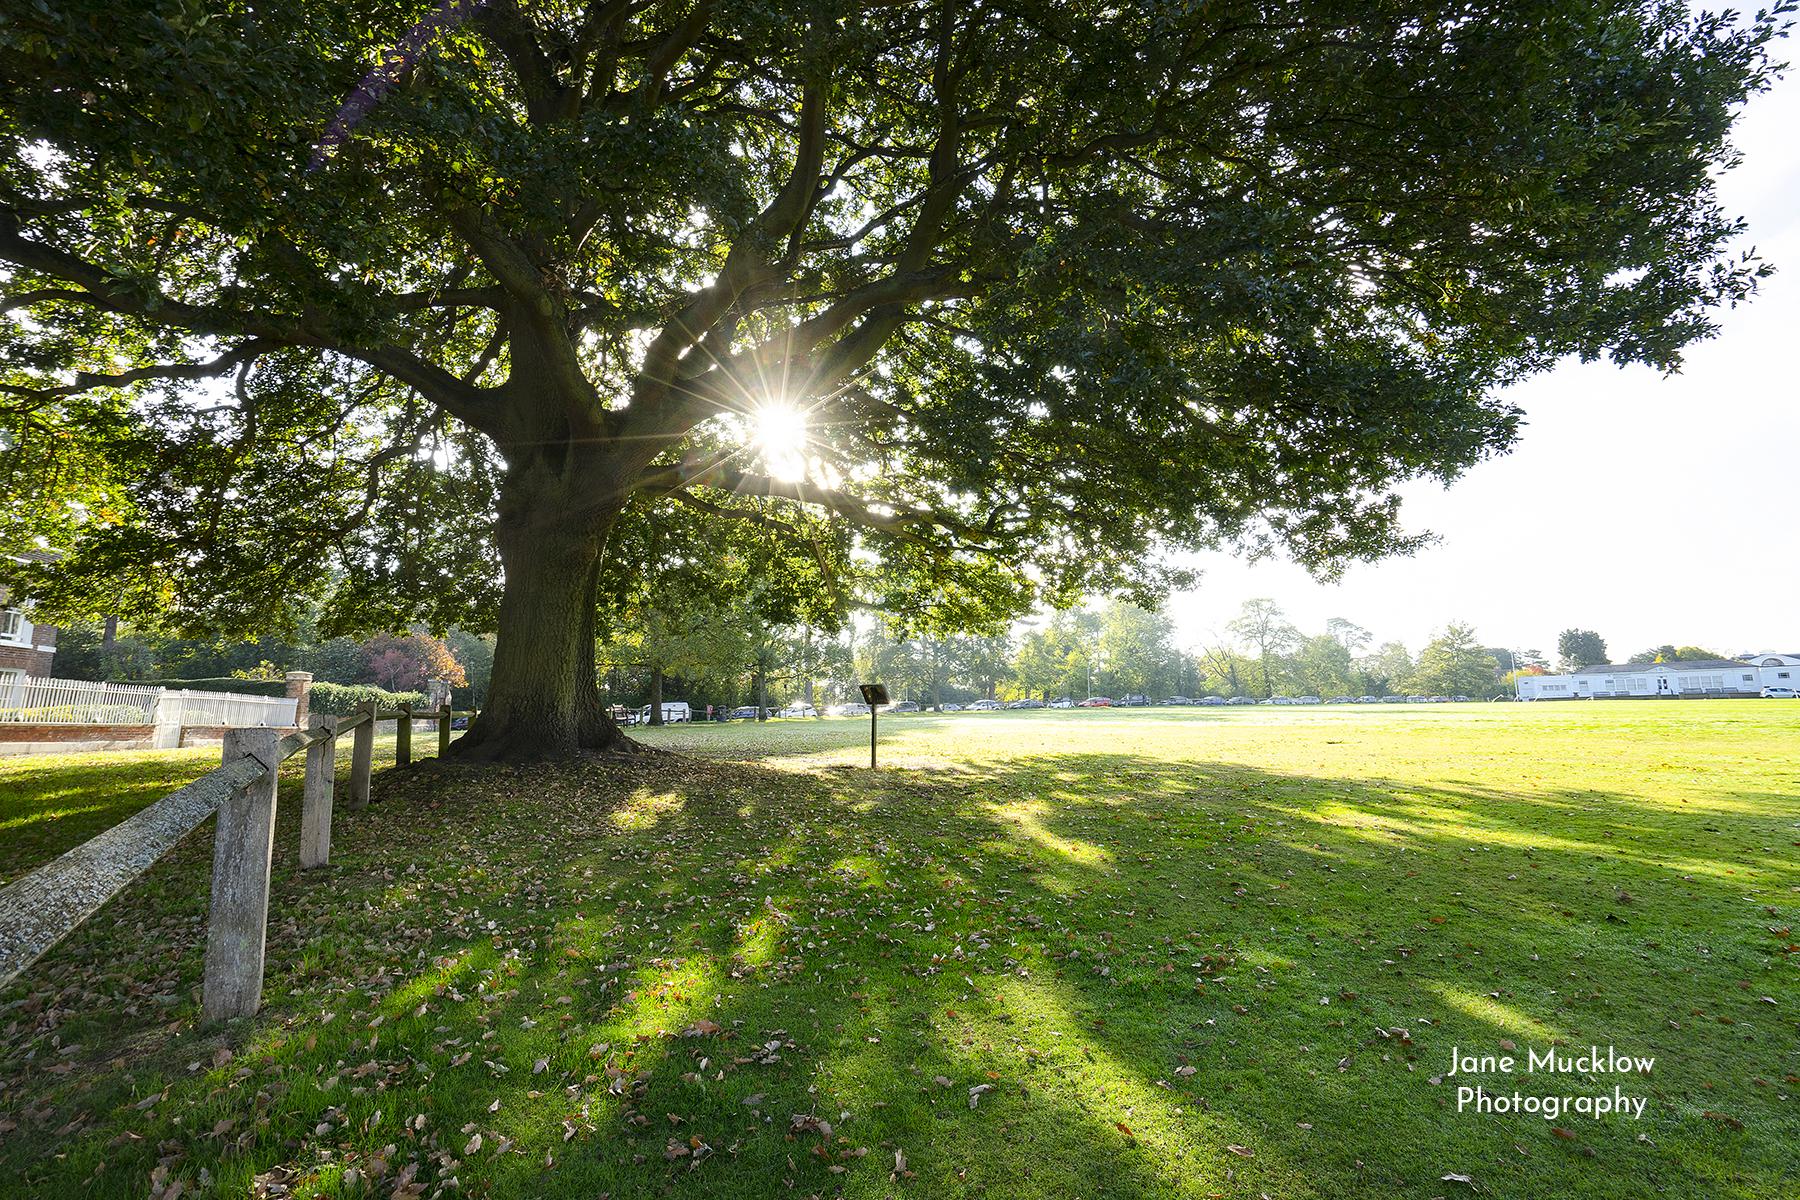 Photo by Jane Mucklow of the morning sun shining through the big oak tree on Sevenoaks Vine, Sevenoaks, Kent.